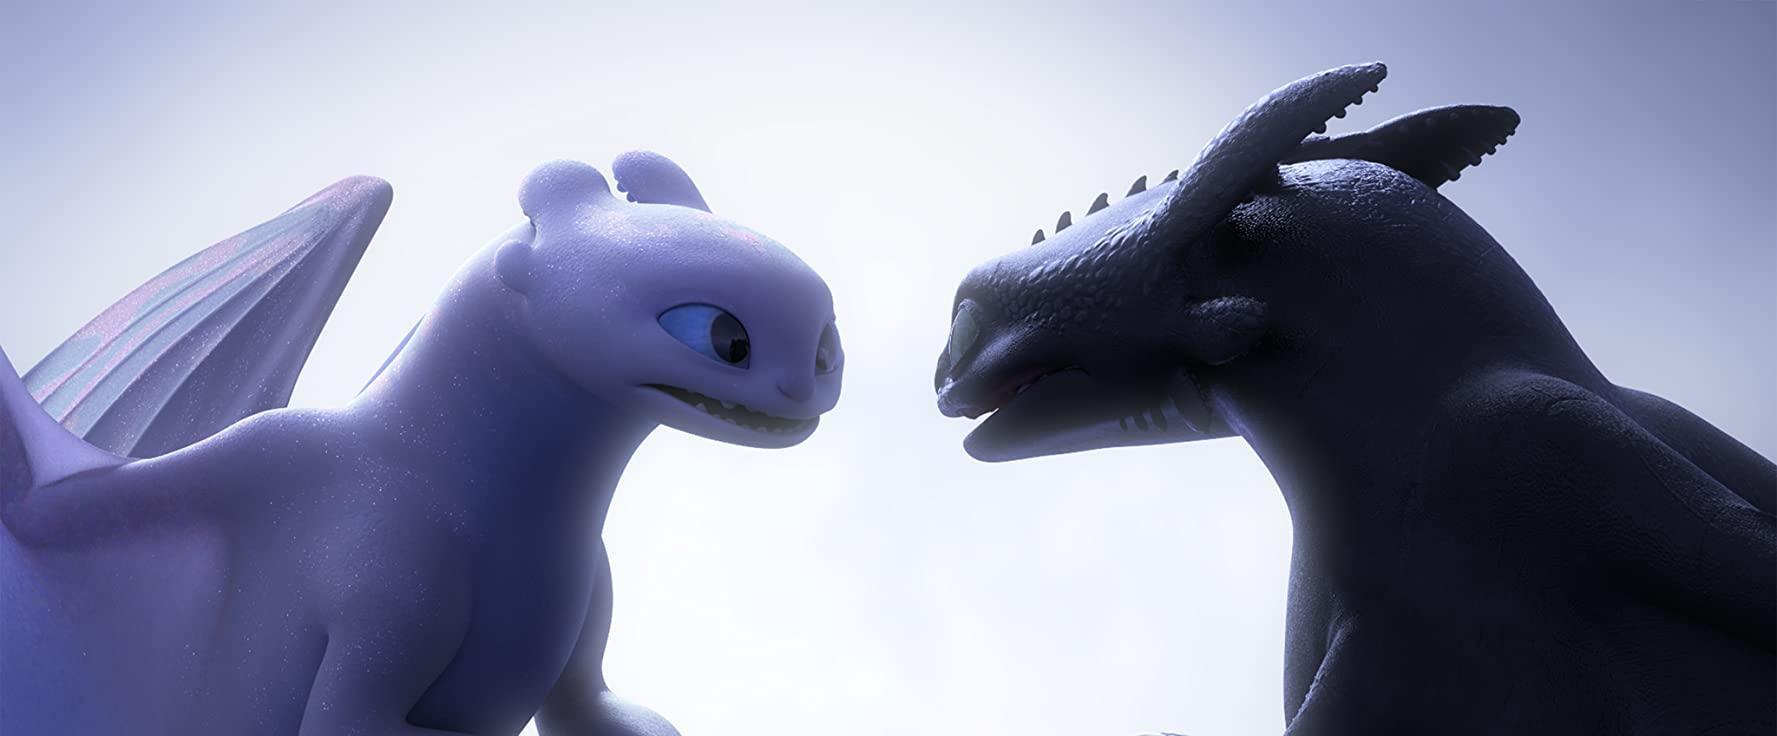 مشاهدة فيلم How to Train Your Dragon The Hidden World (2019) مترجم HD اون لاين